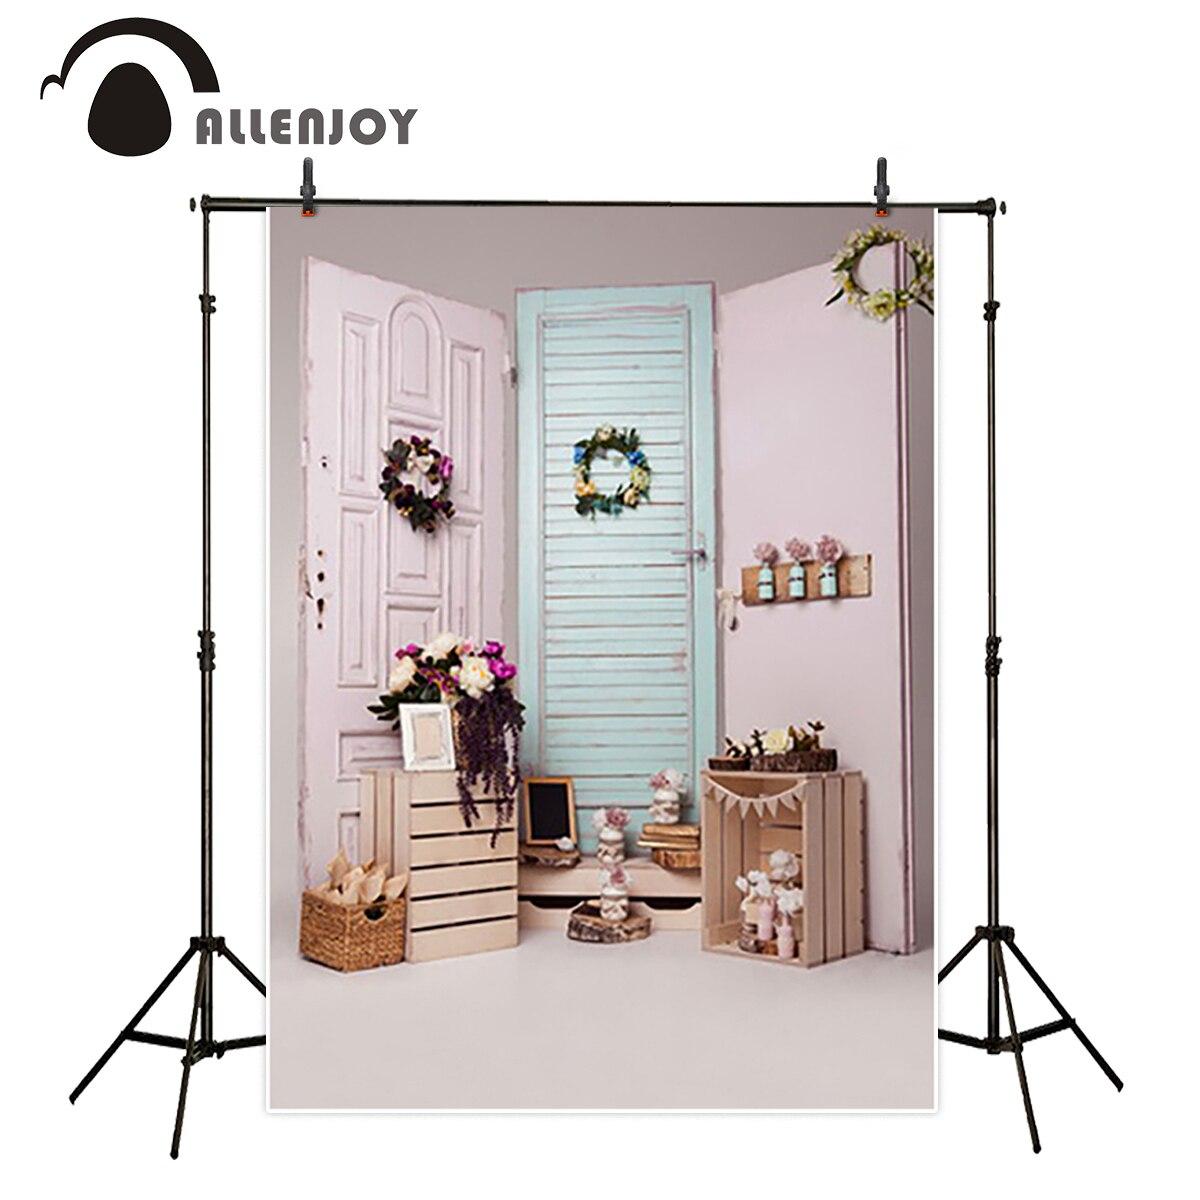 Allenjoy vinyl backdrops for photography backdrop Pink door Garland Girl personally customize children Background for Studio